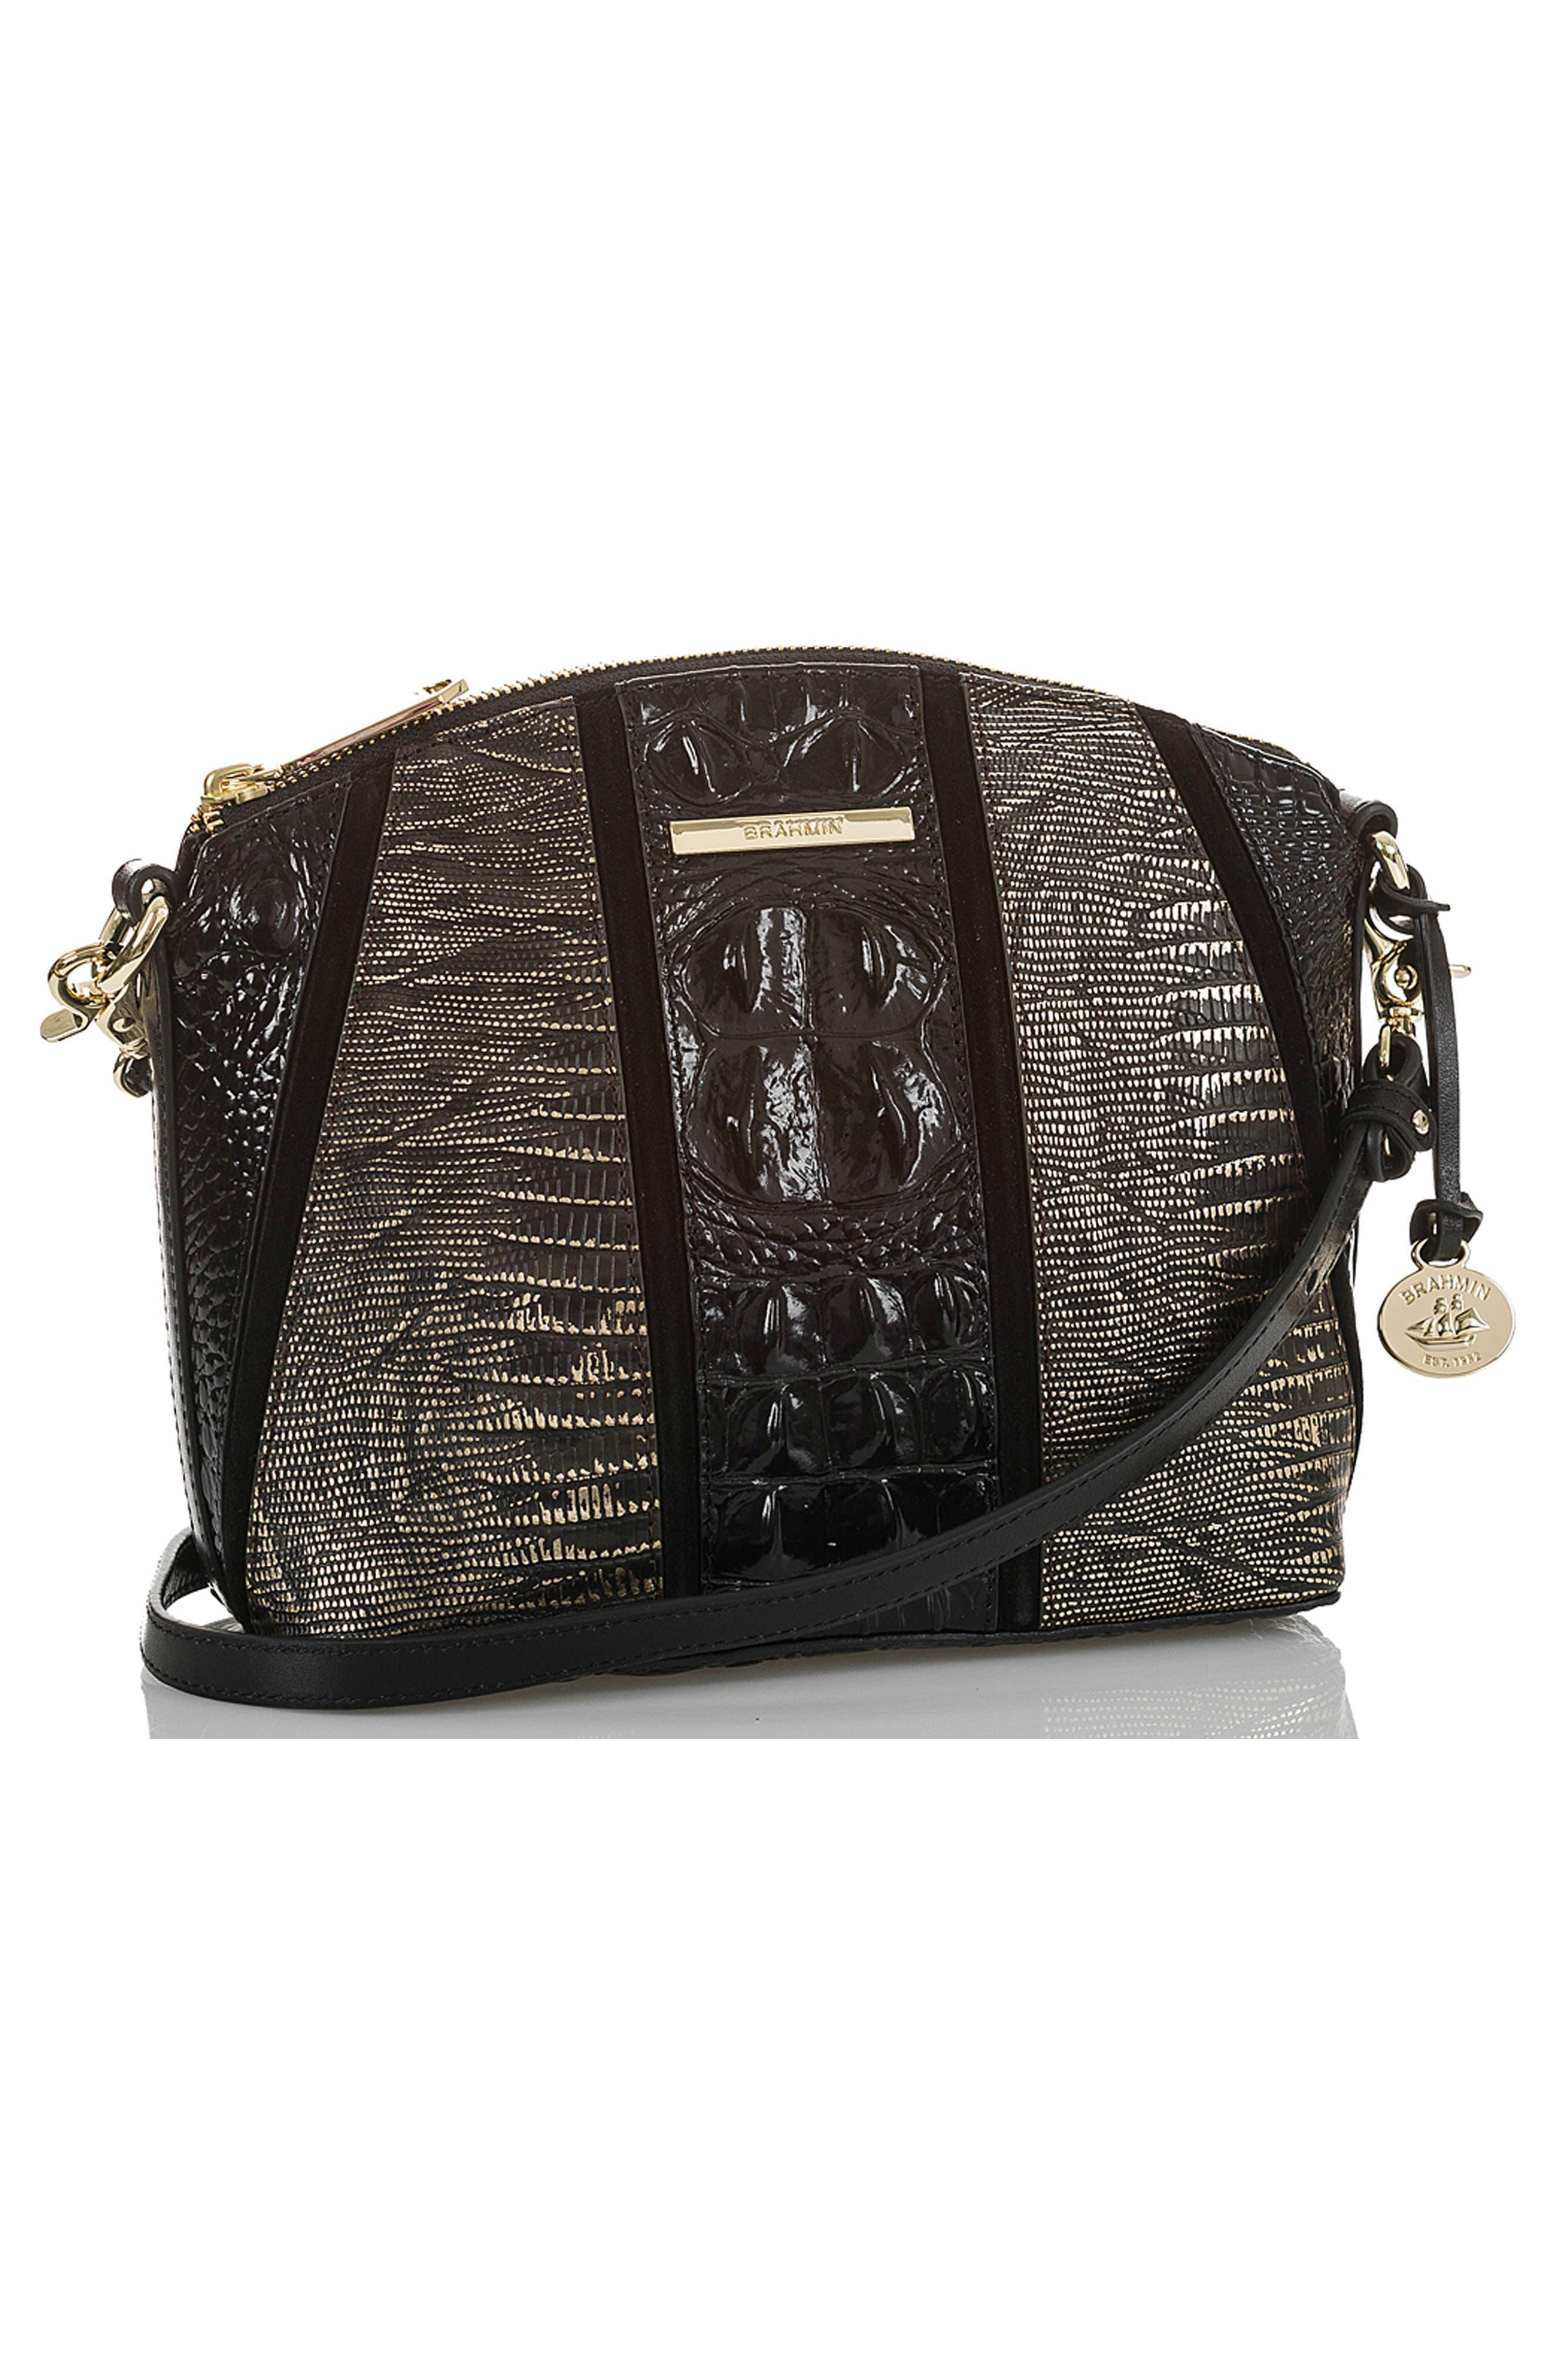 BRAHMIN, Mini Duxbury Embossed Leather Crossbody Bag, Alternate thumbnail 4, color, 028